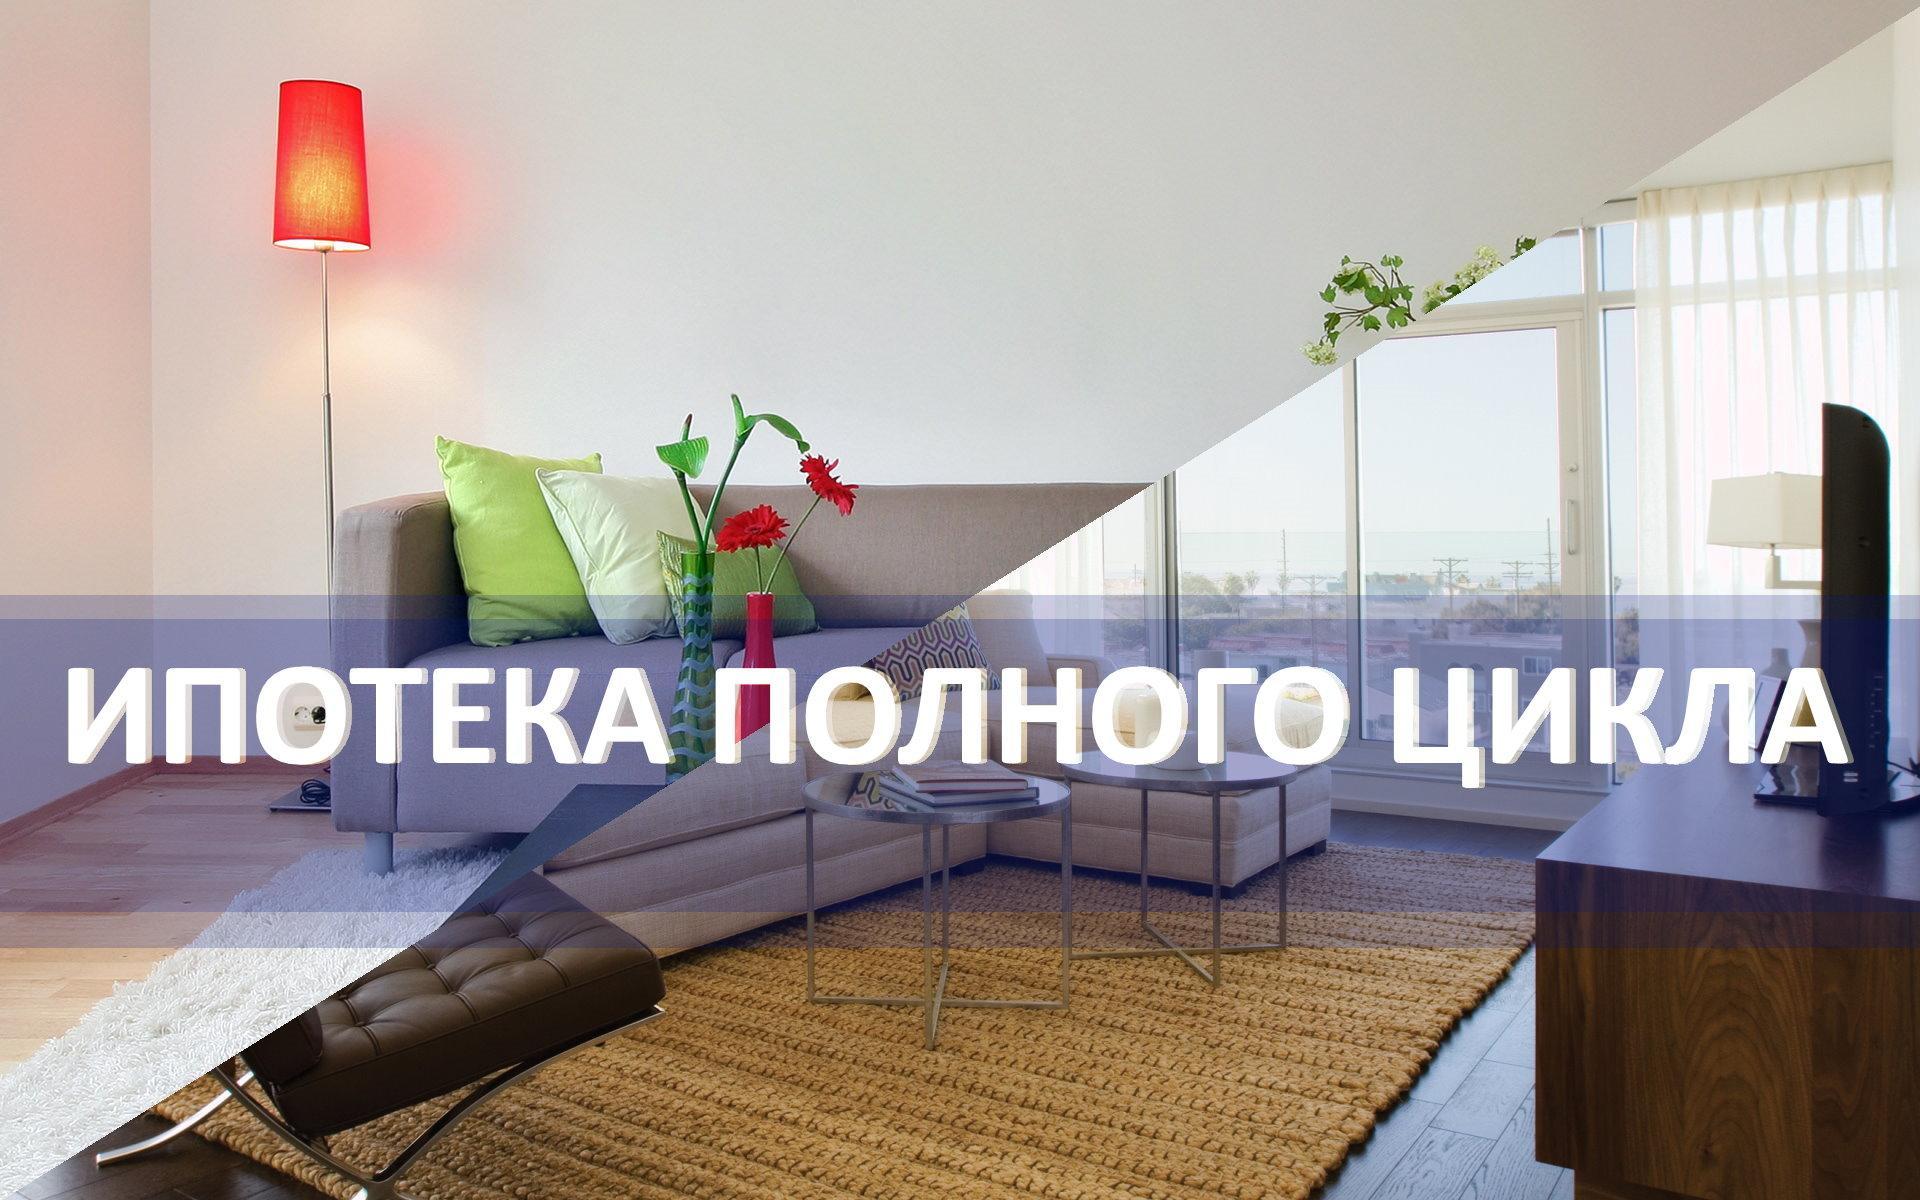 Продажа Аренда Обмен недвижимости